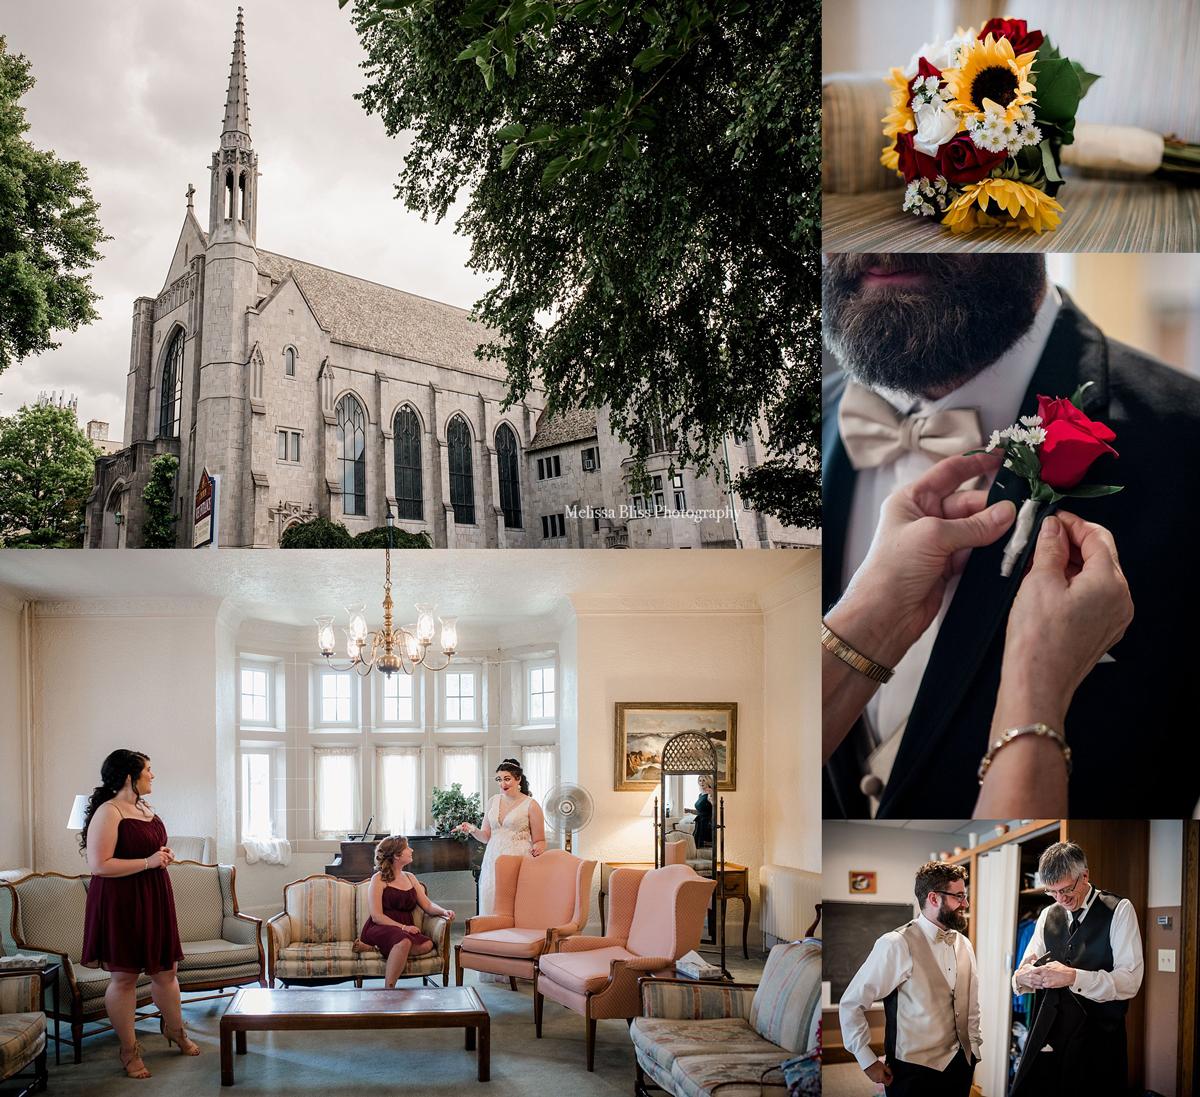 va-wedding-photographer-williamsburg-richmond-norfolk-portsmouth-va-beach-wedding-photographer-melissa-bliss-photography-destinations-PA-wedding.jpg